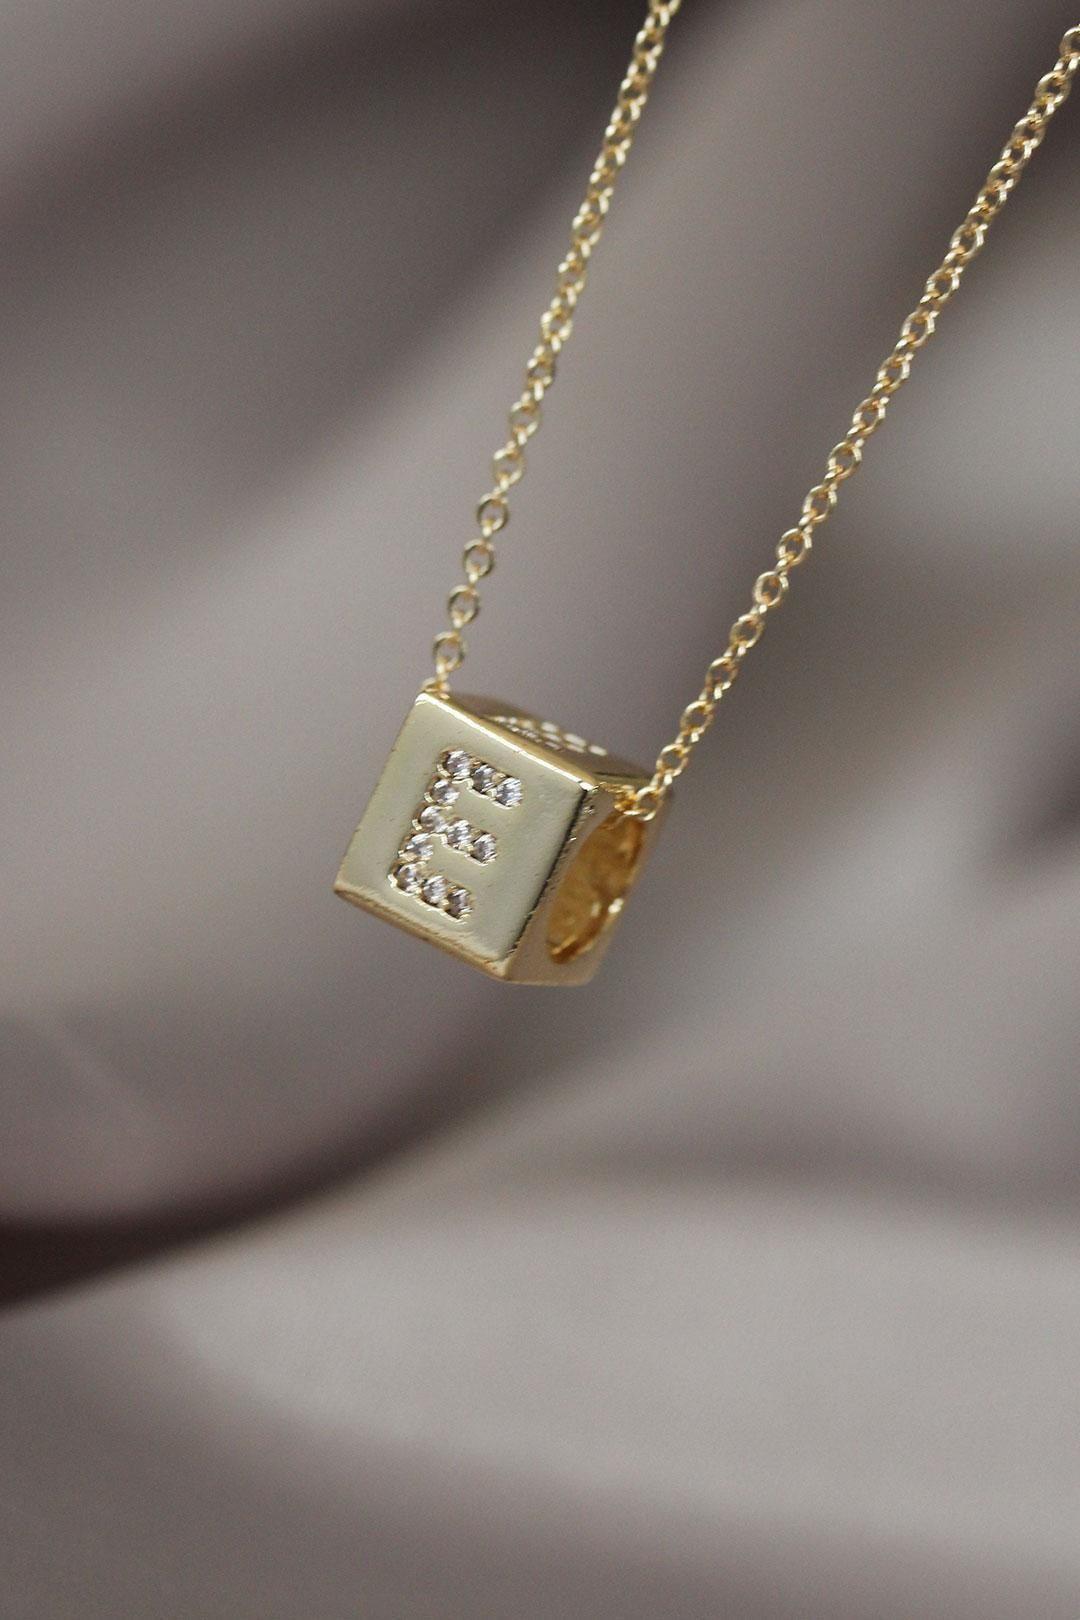 Gold Renk Zirkon Taşlı Küp Model E Harfli Kolye